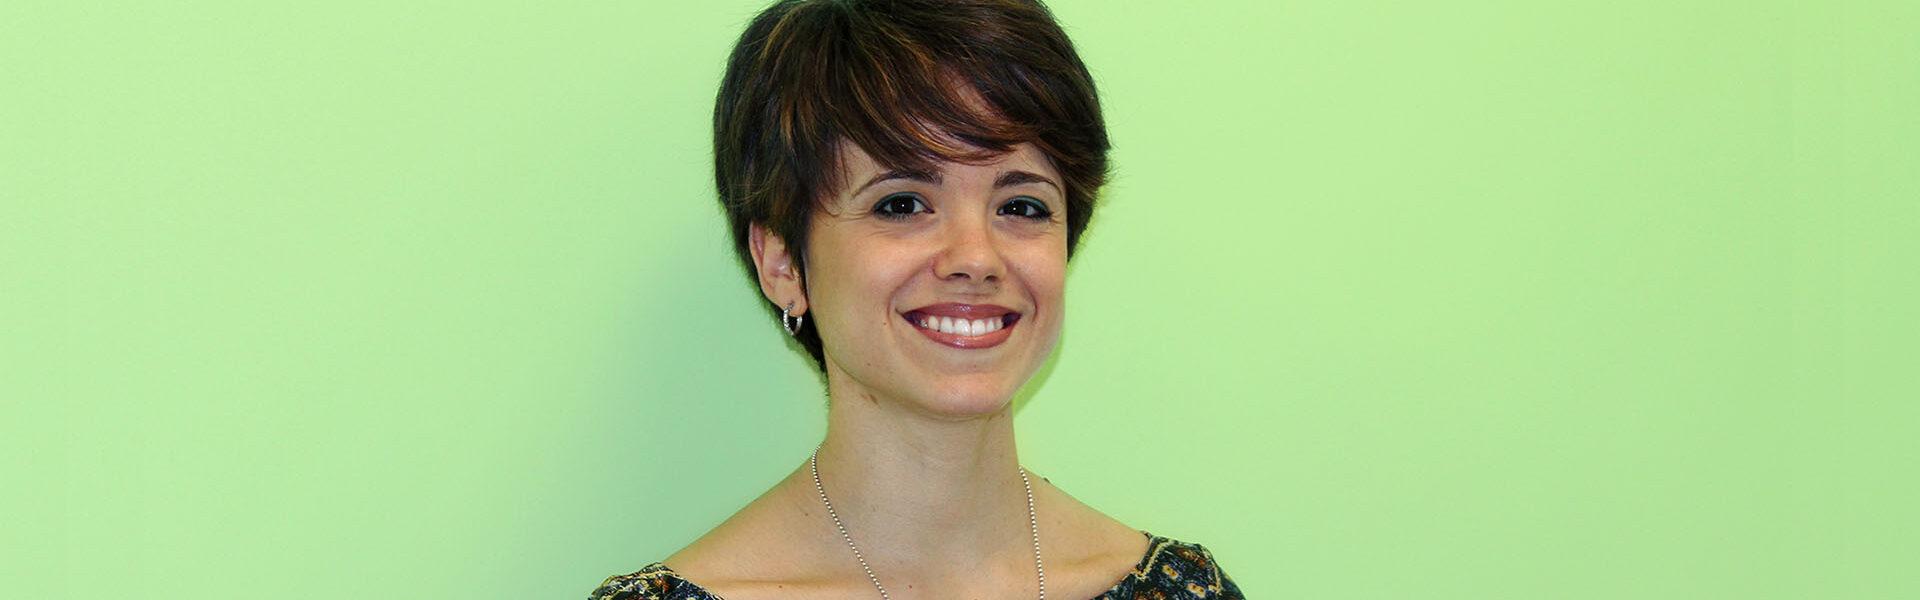 Silvia Giovinazzo, Neuropsichiatra infantile